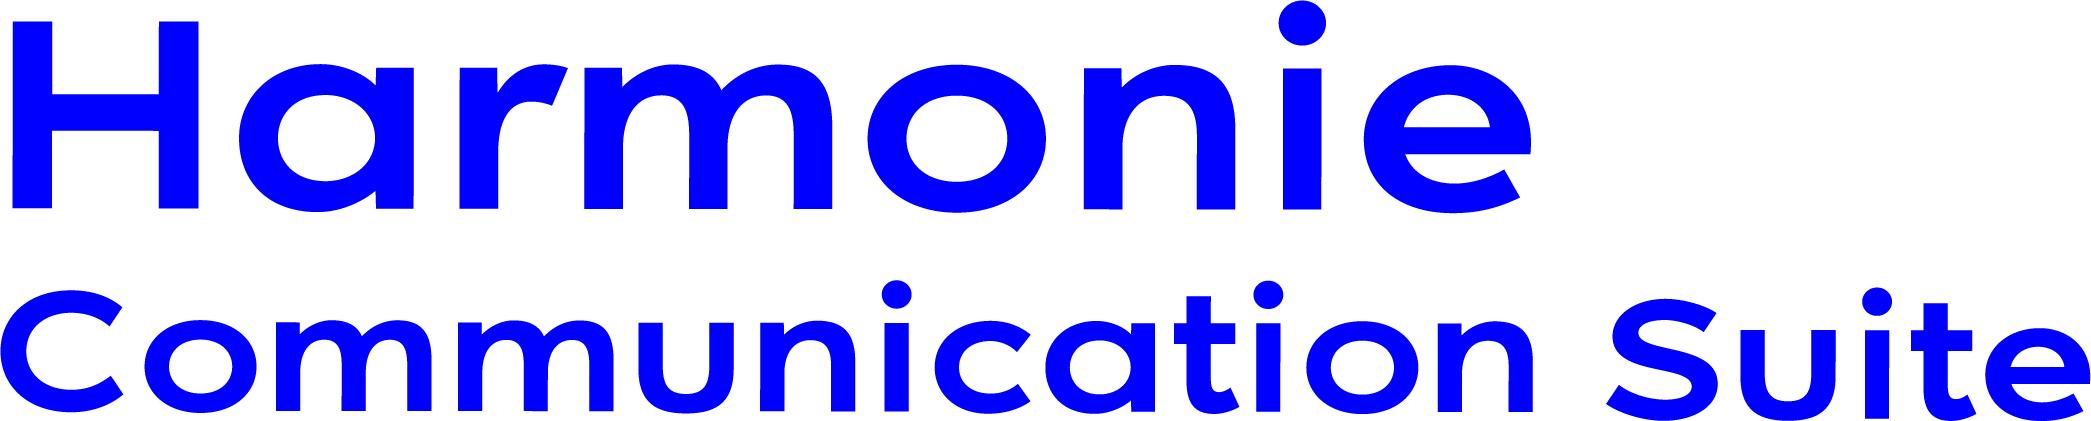 Harmonie Communication Suite (HCS)